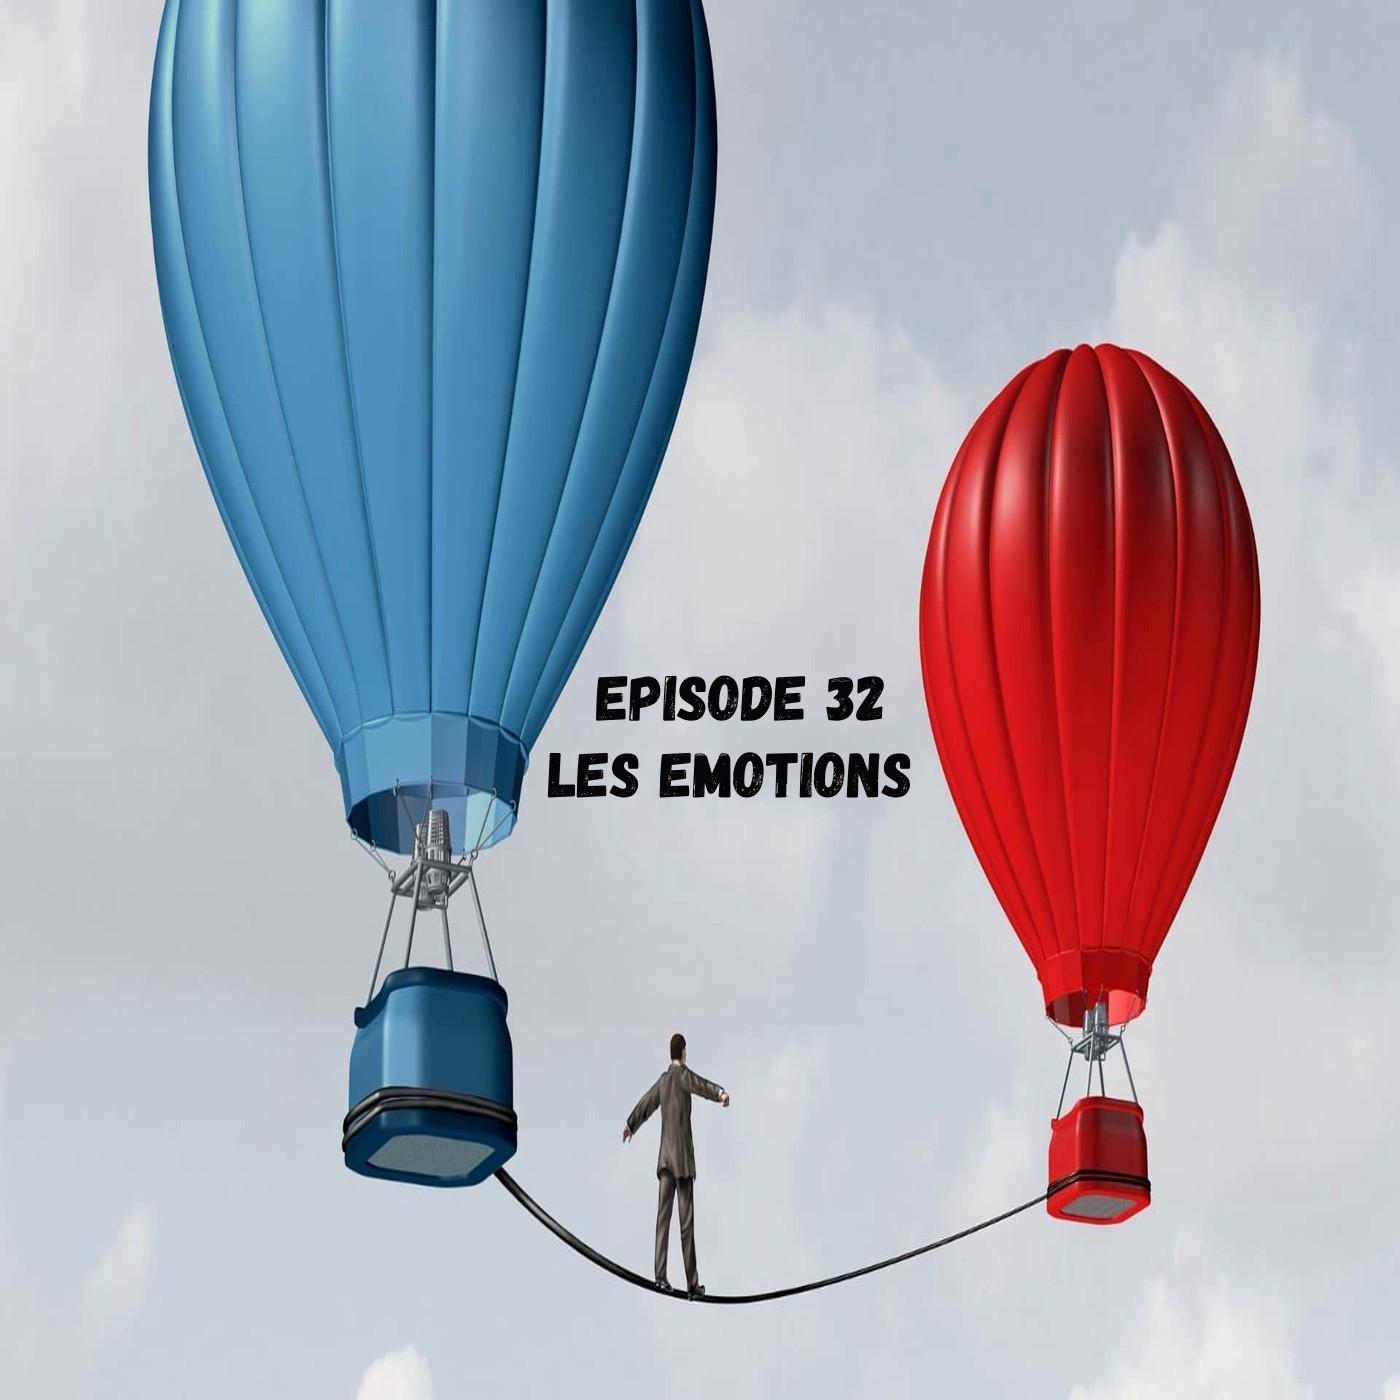 Episode 32 Nos émotions